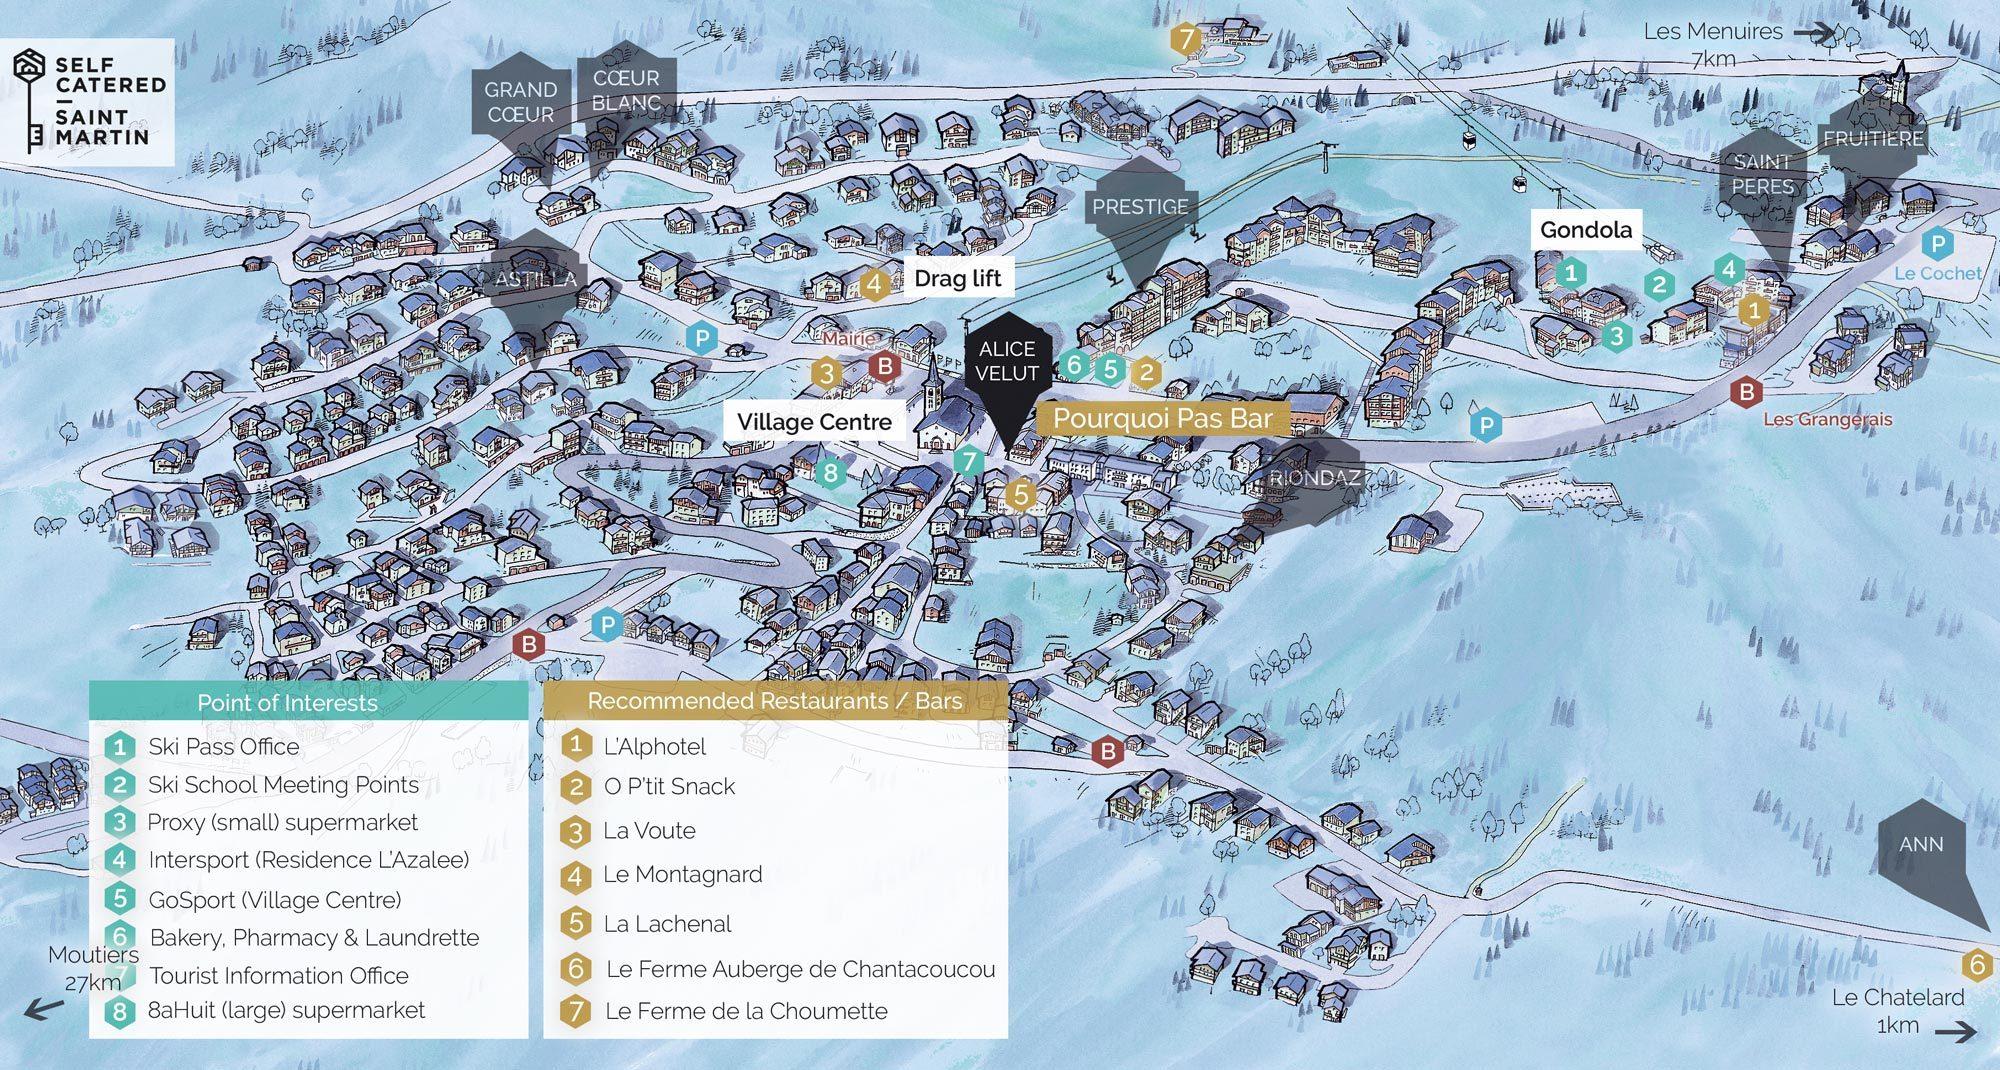 Chalet Alice Velut in St Martin de Belleville | Resort Map | Self Catered - Saint Martin